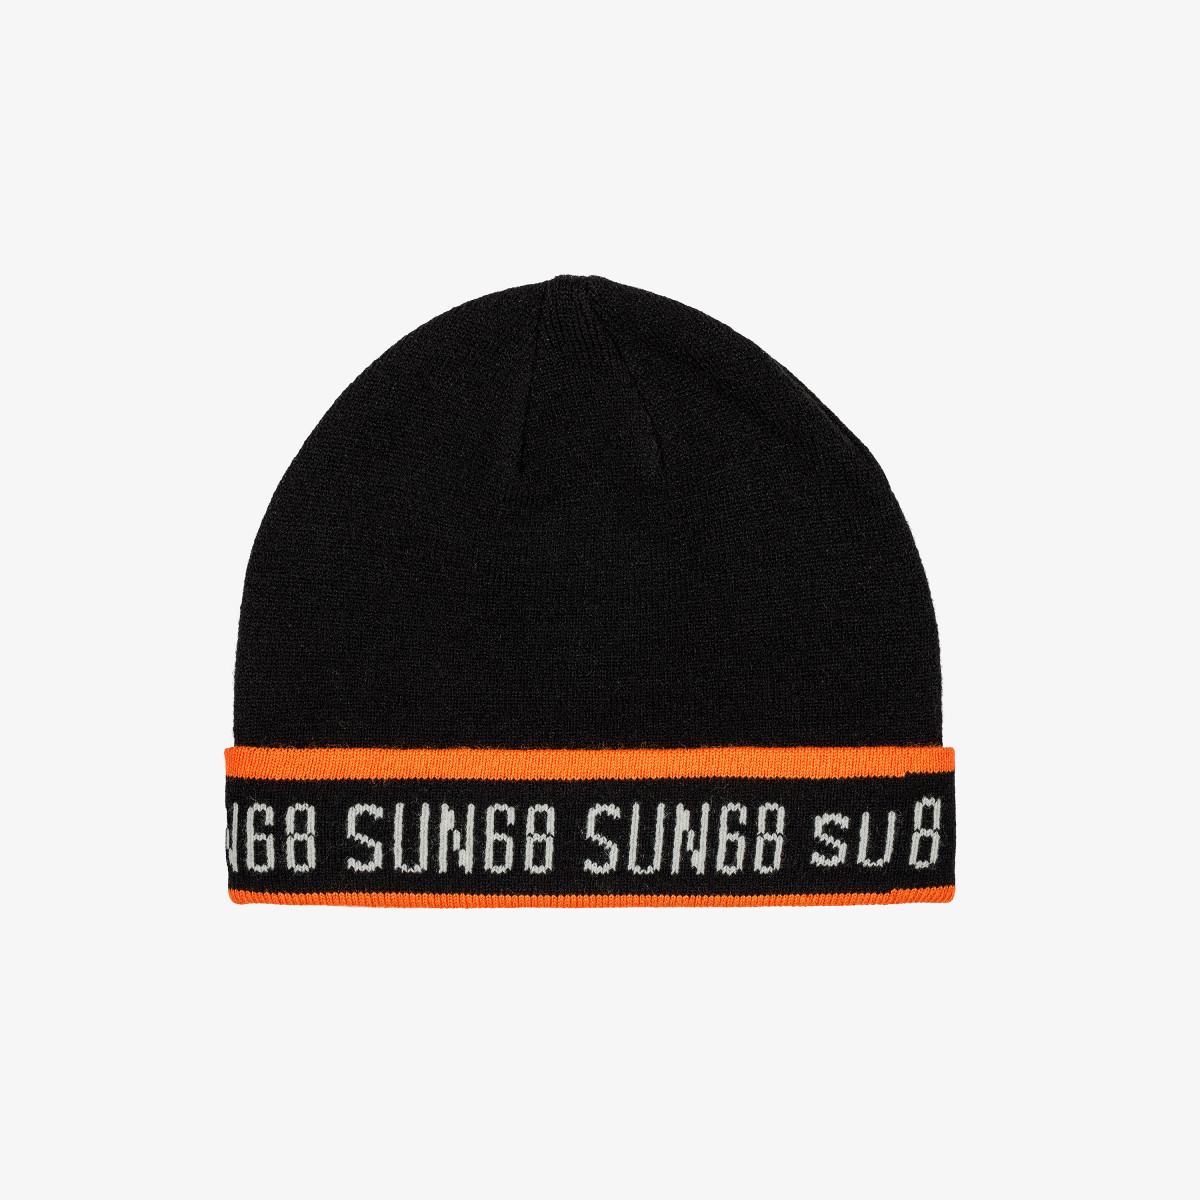 BOY'S CAP FLUO LOGO BLACK